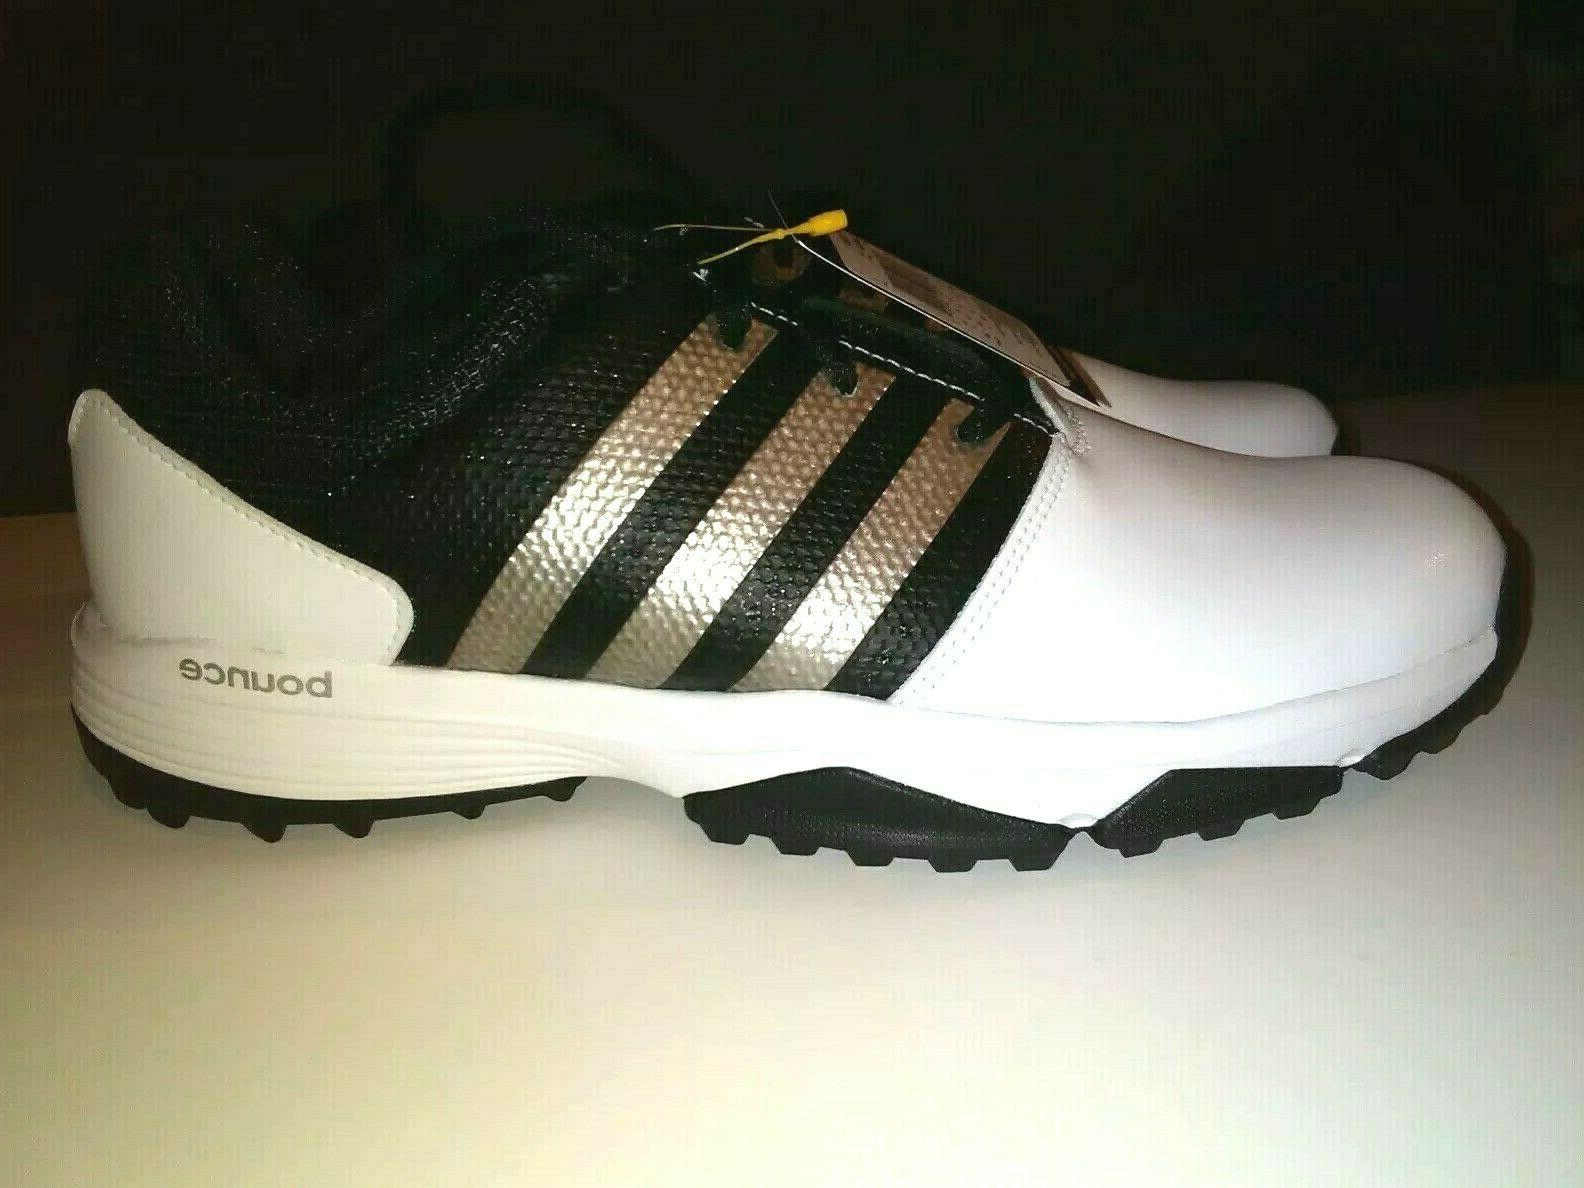 New NWT Traxion Men's Golf Q44994 Size 8.5